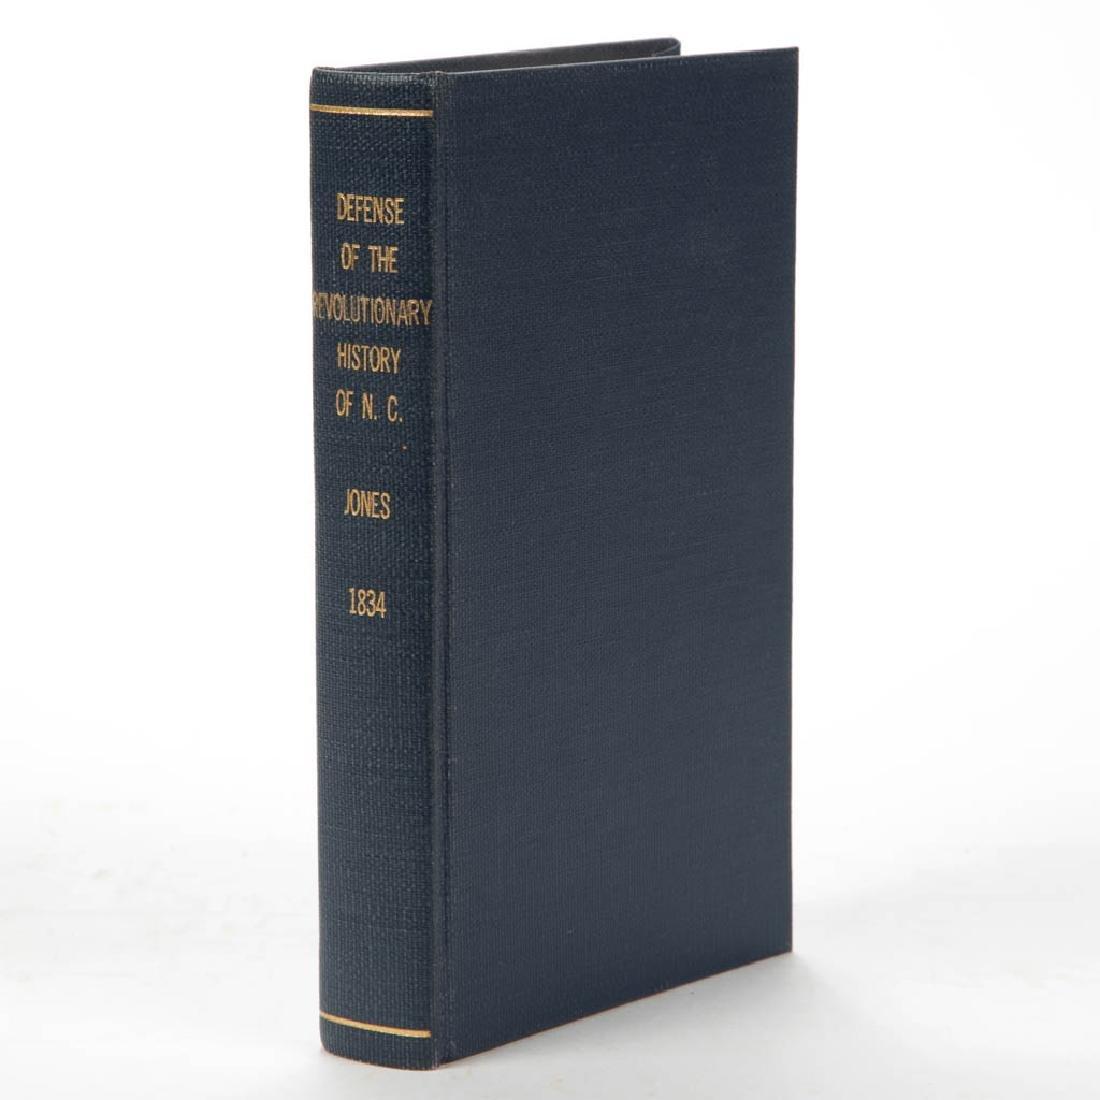 AMERICAN HISTORICAL NORTH CAROLINA REFERENCE VOLUME - 2